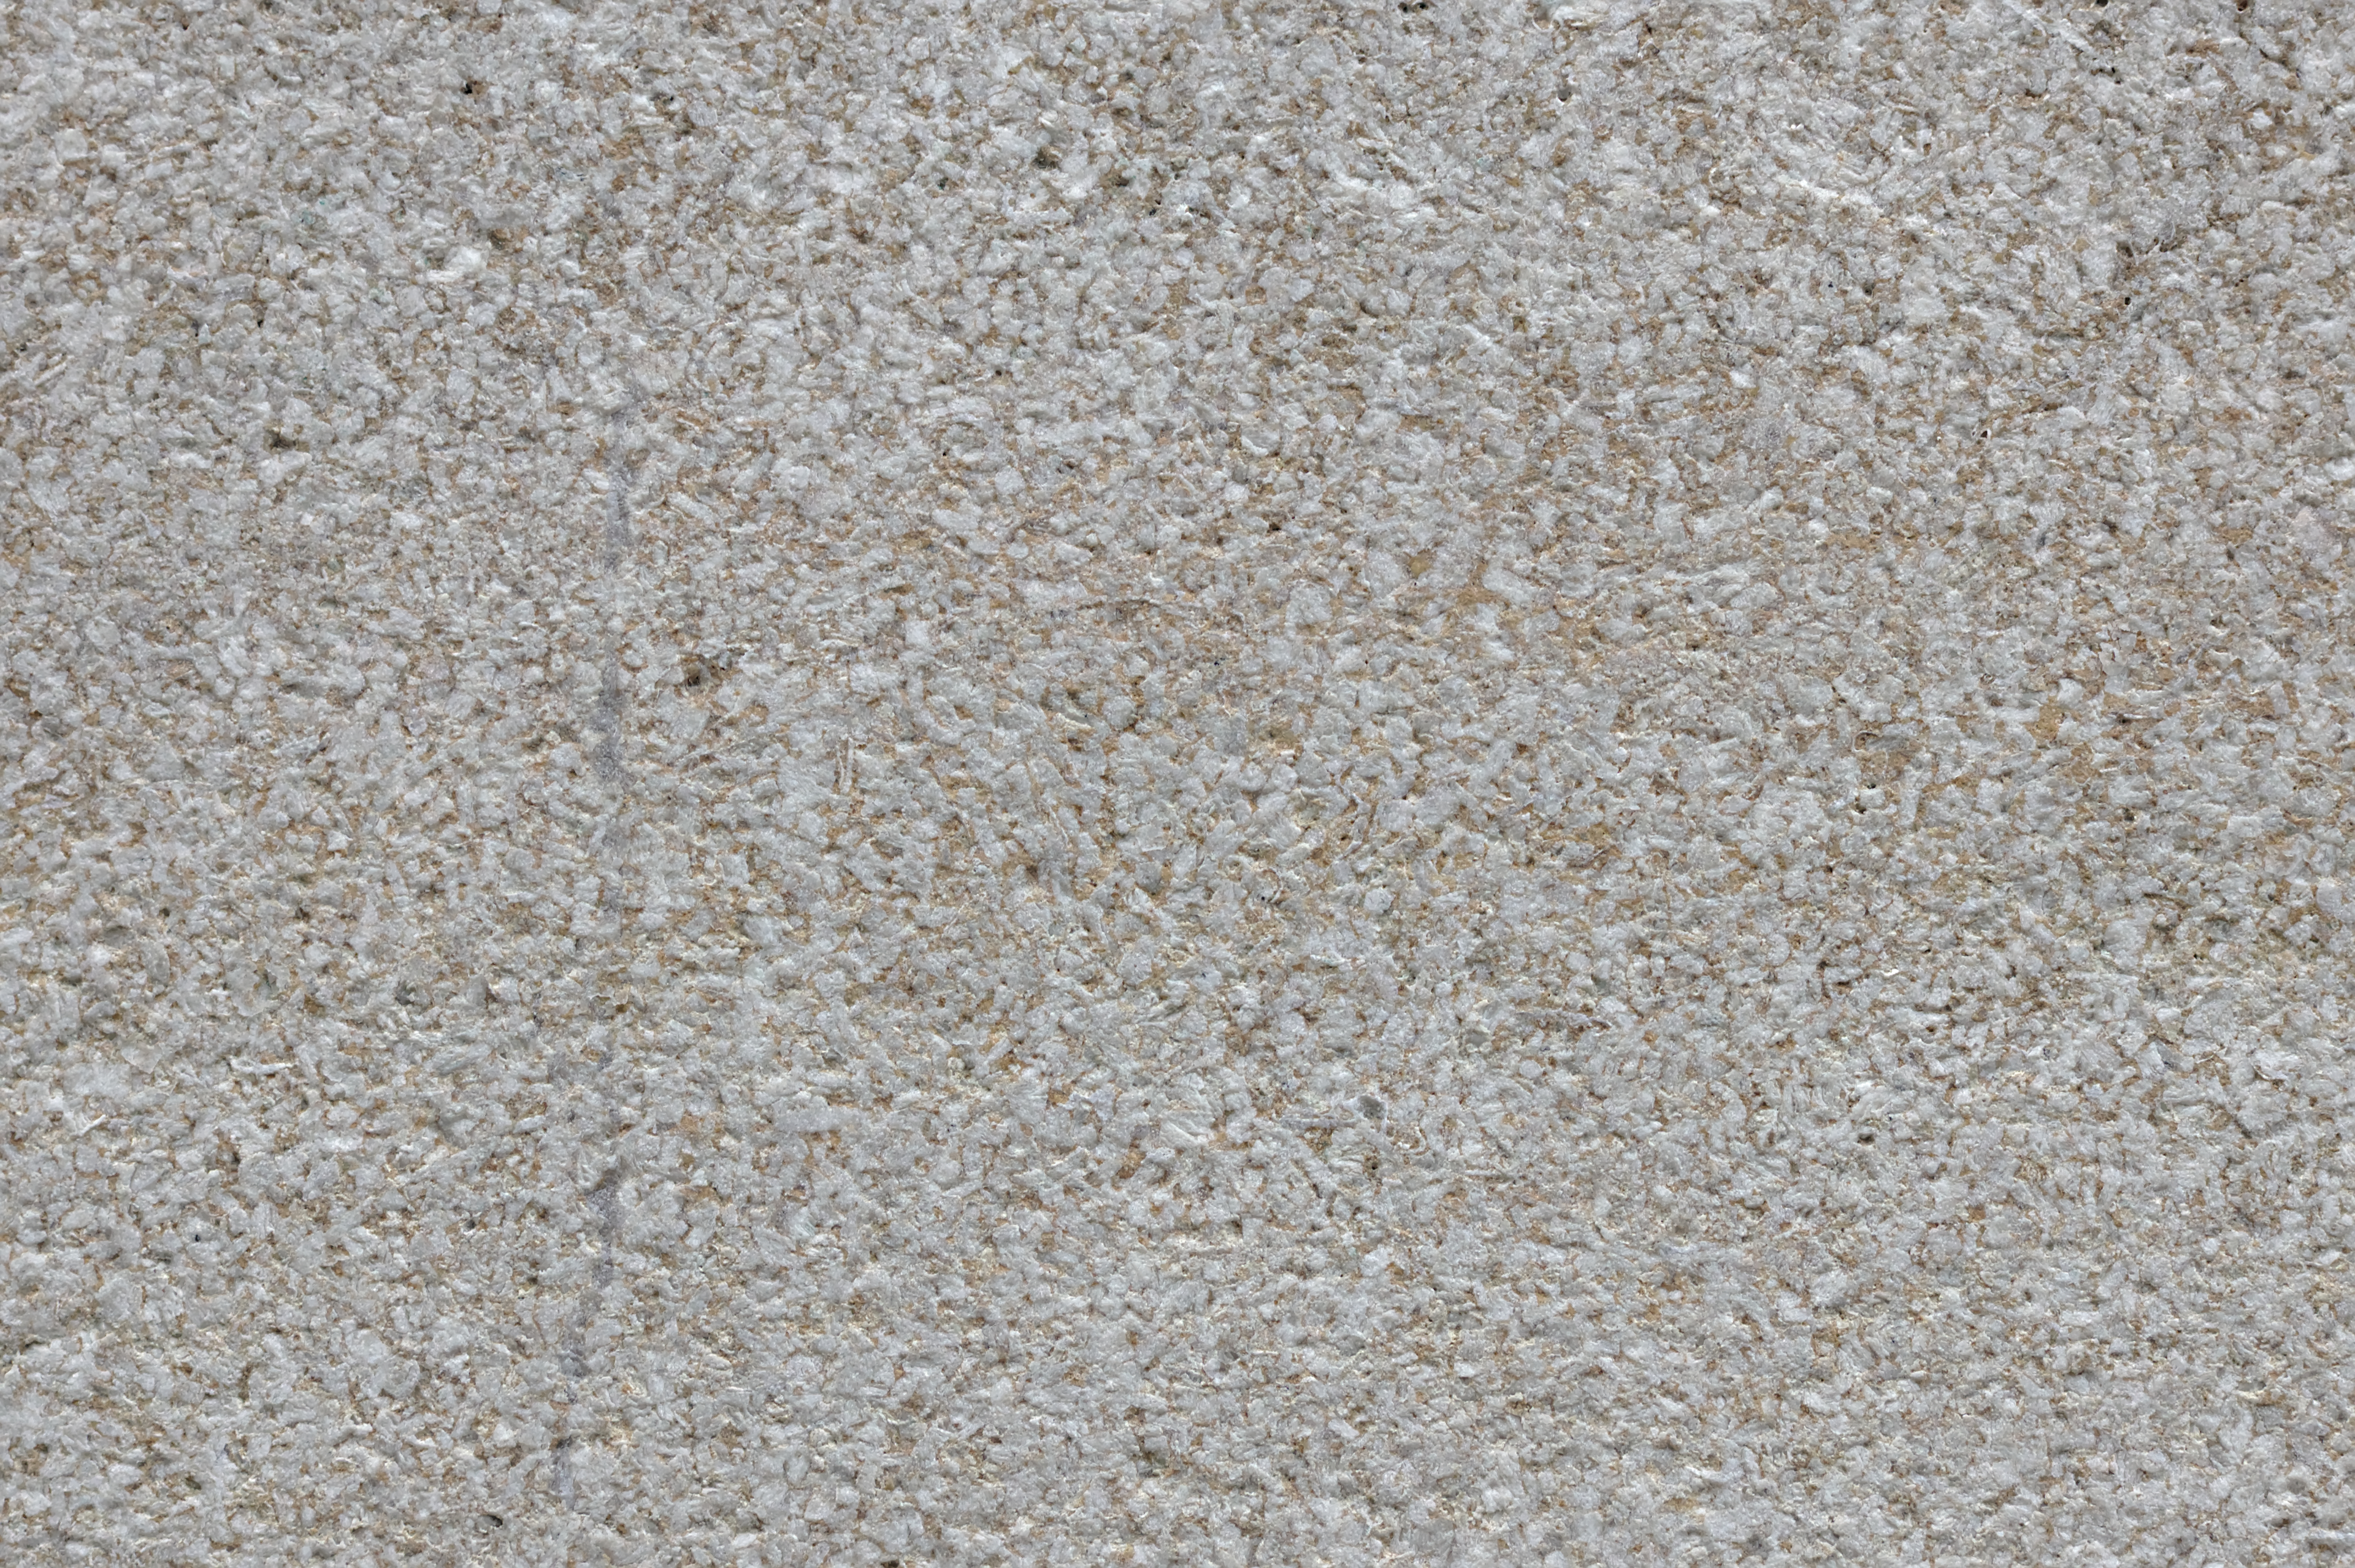 White Marble Granite Kitchen Countertop